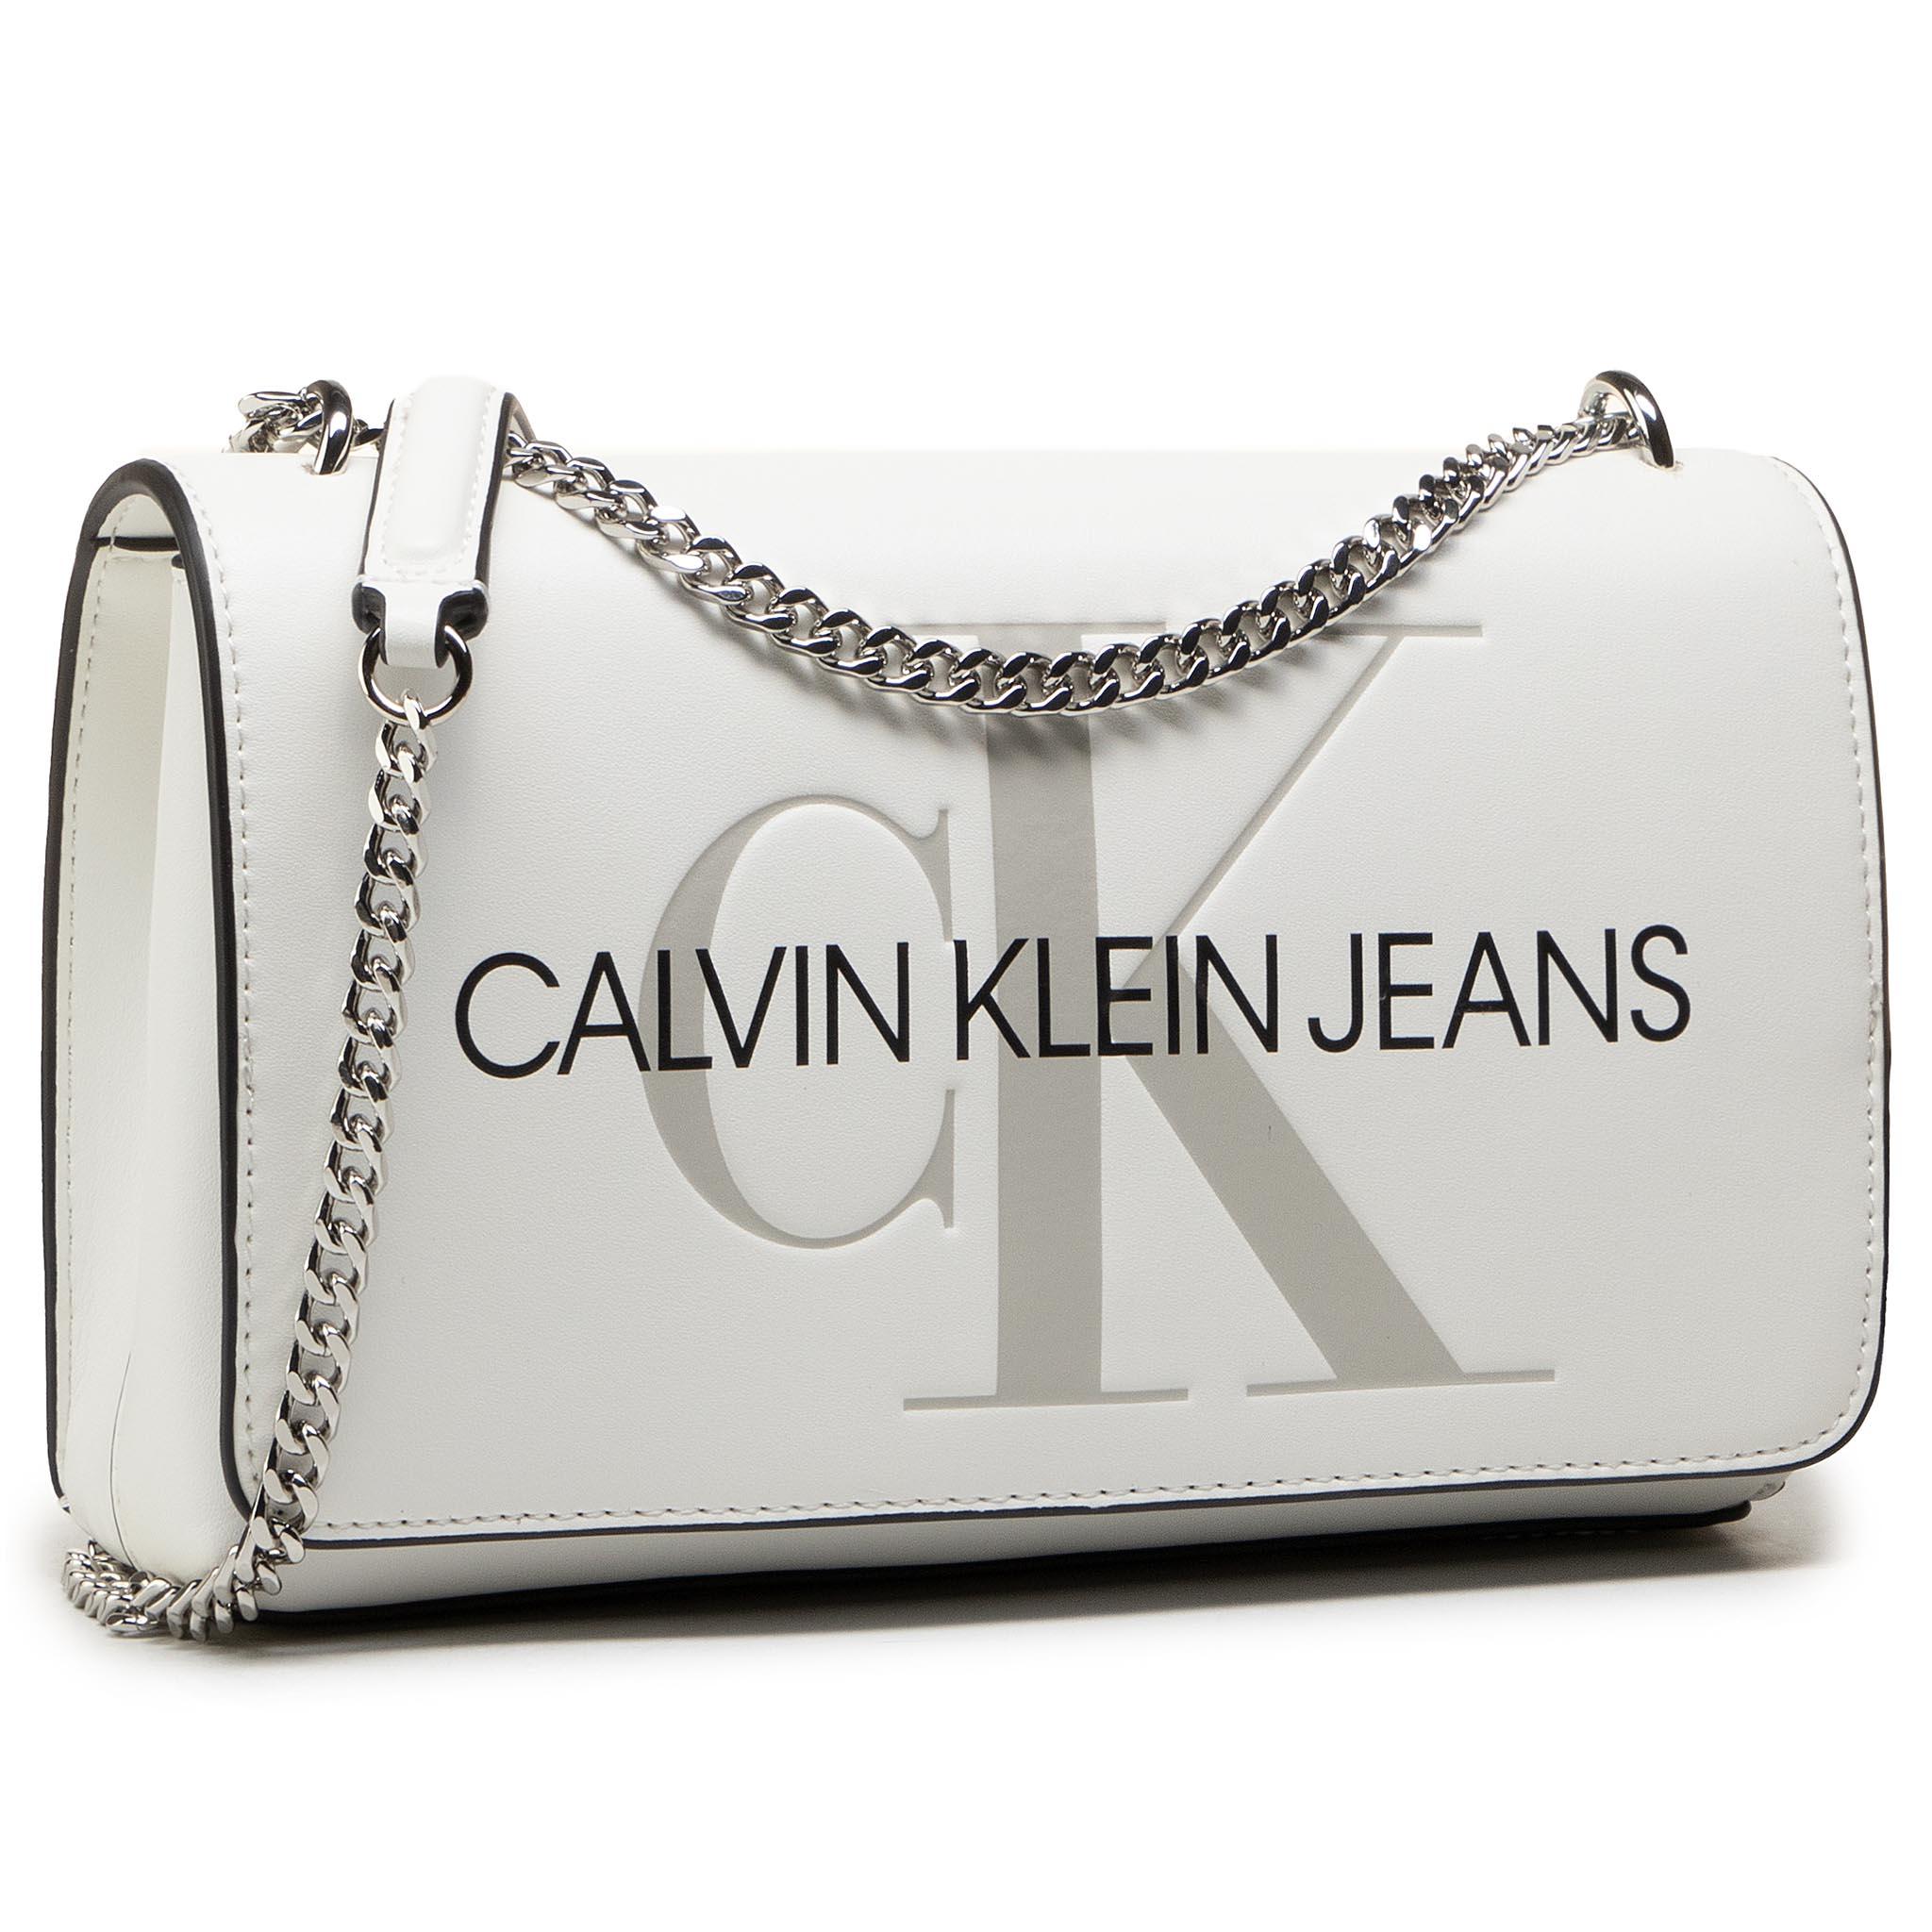 Image of Handtasche CALVIN KLEIN JEANS - Convertible Ew Flap K60K607198 YAF